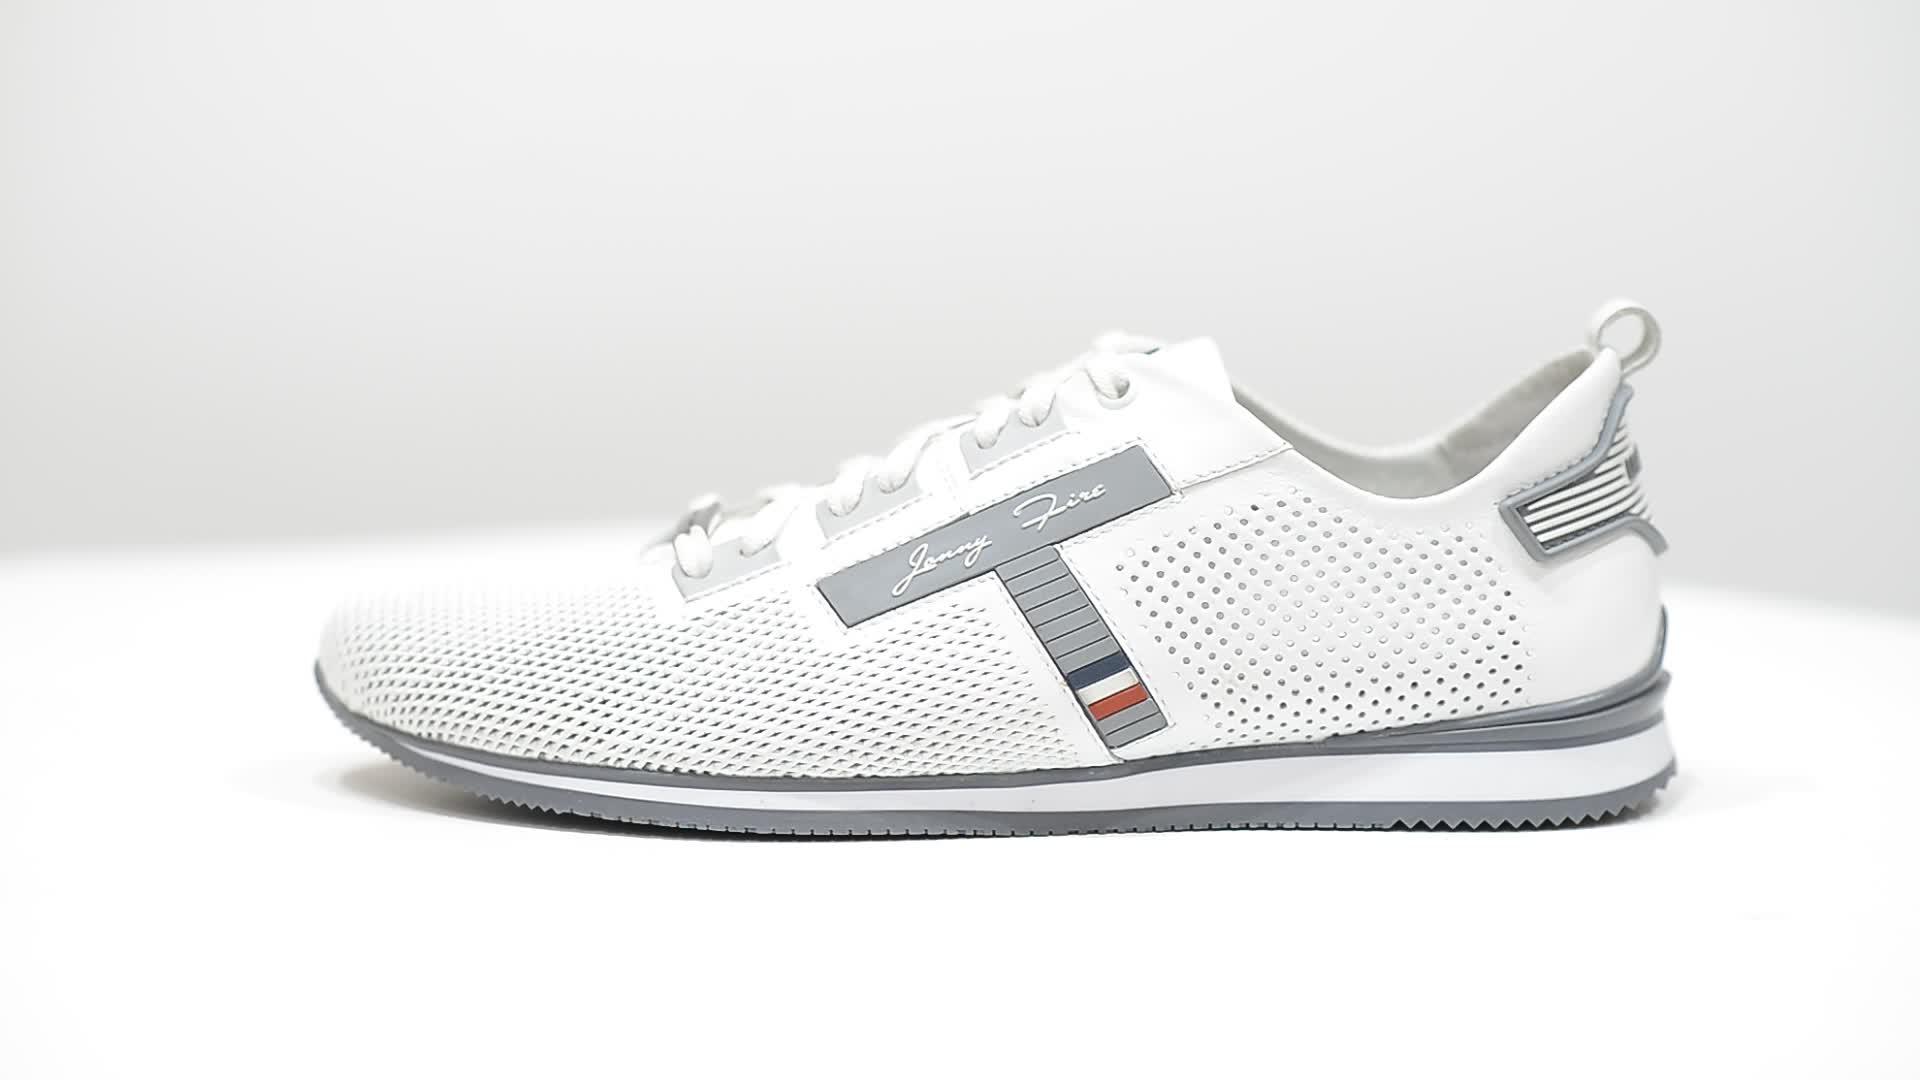 Men's Casual Shoes Sneakers , L738 vp